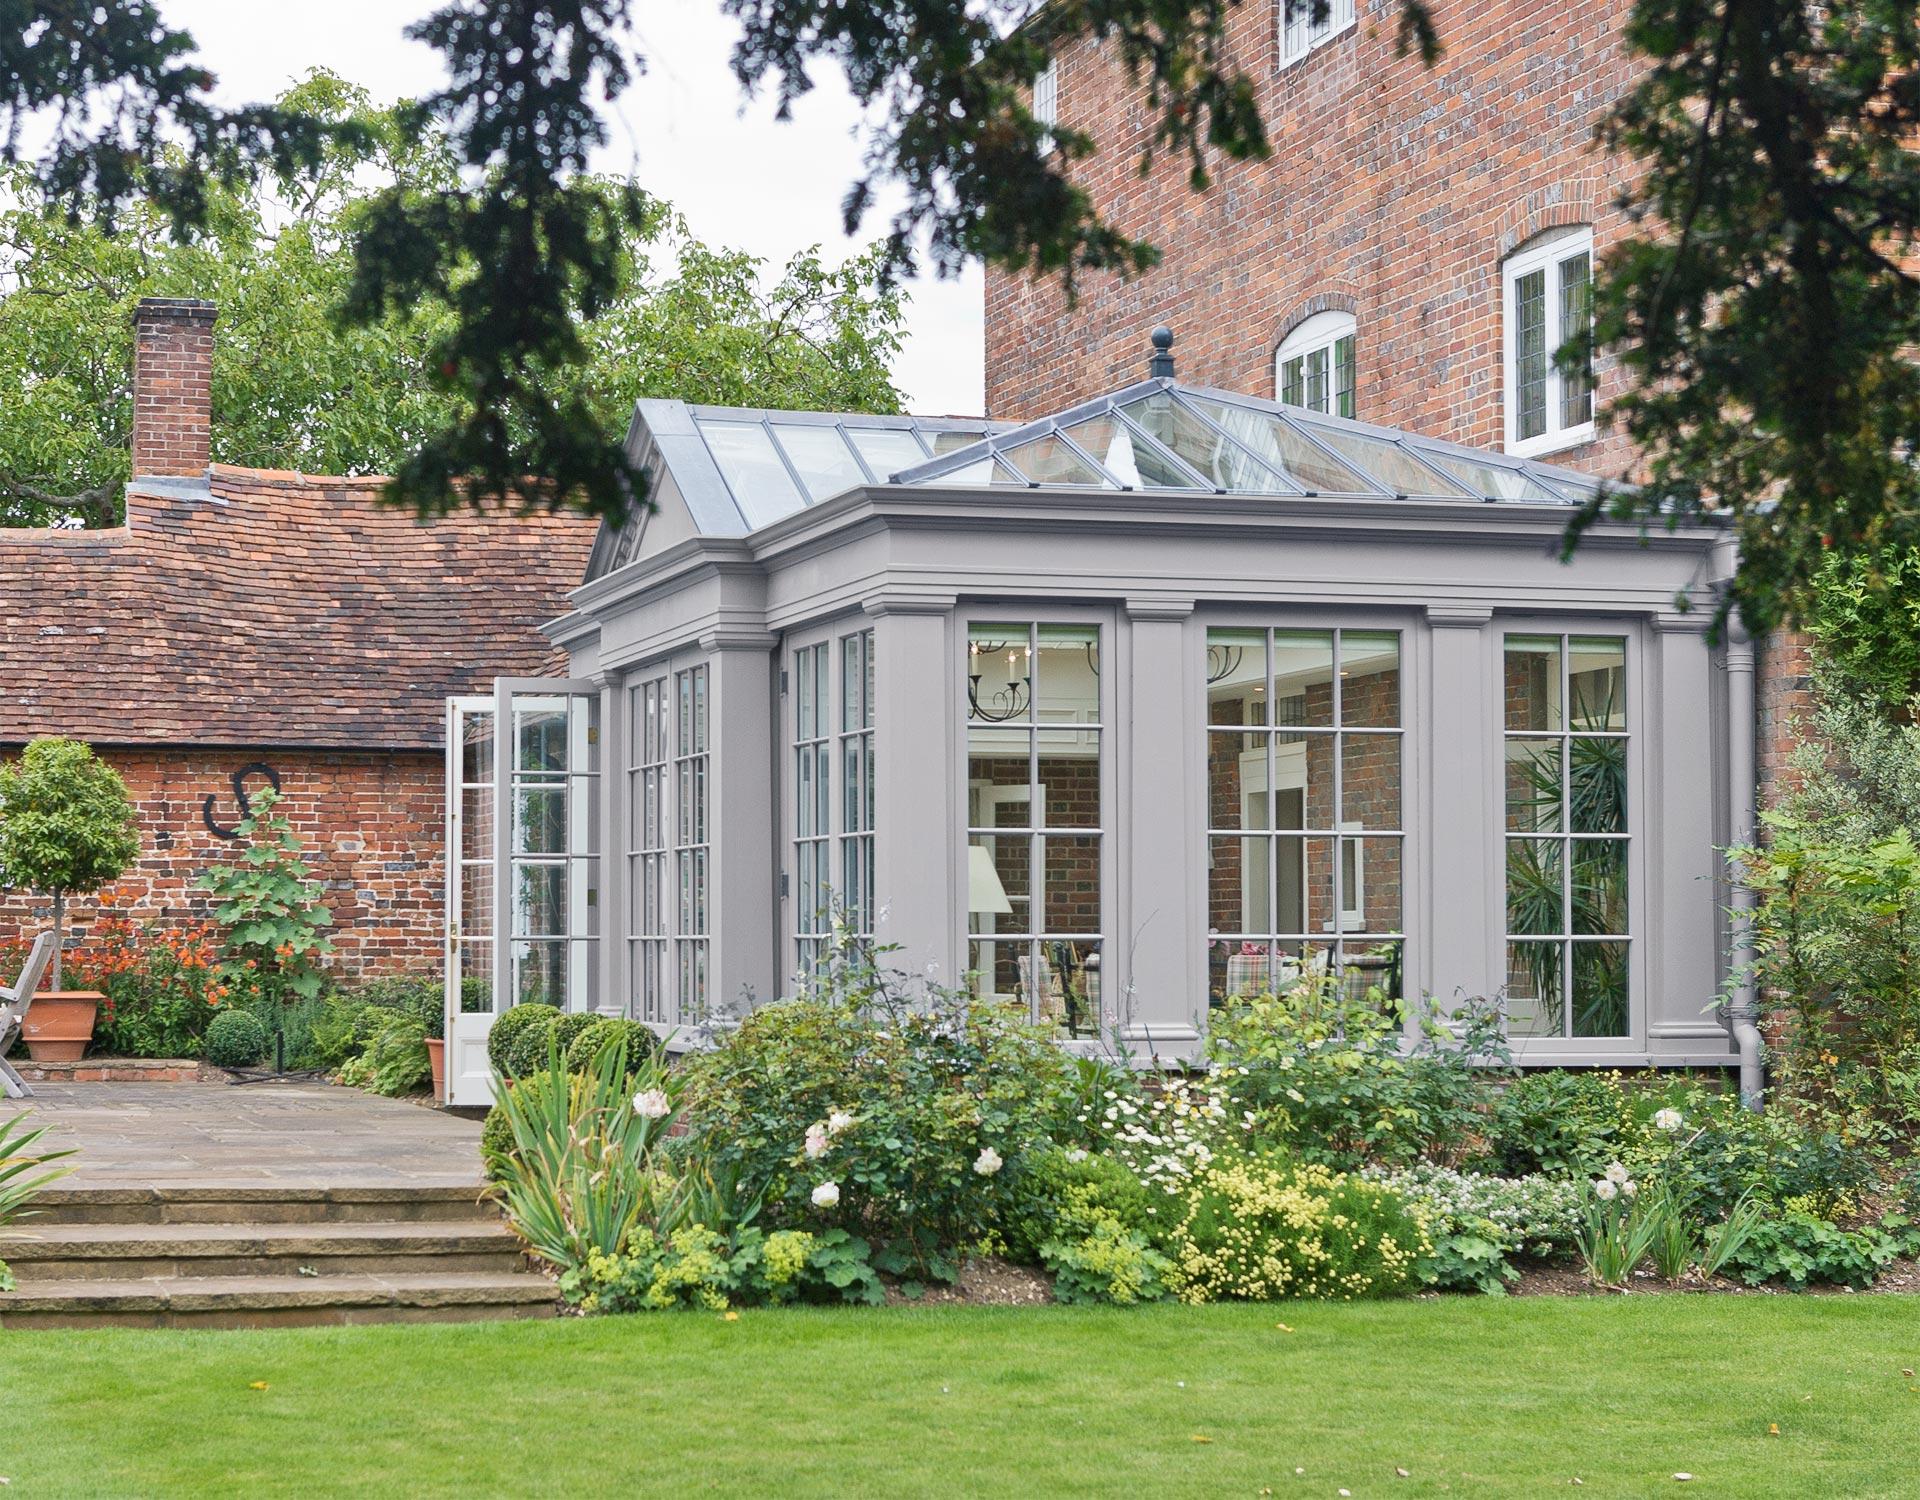 Orangeries bespoke orangeries by vale garden houses for Classic uk house